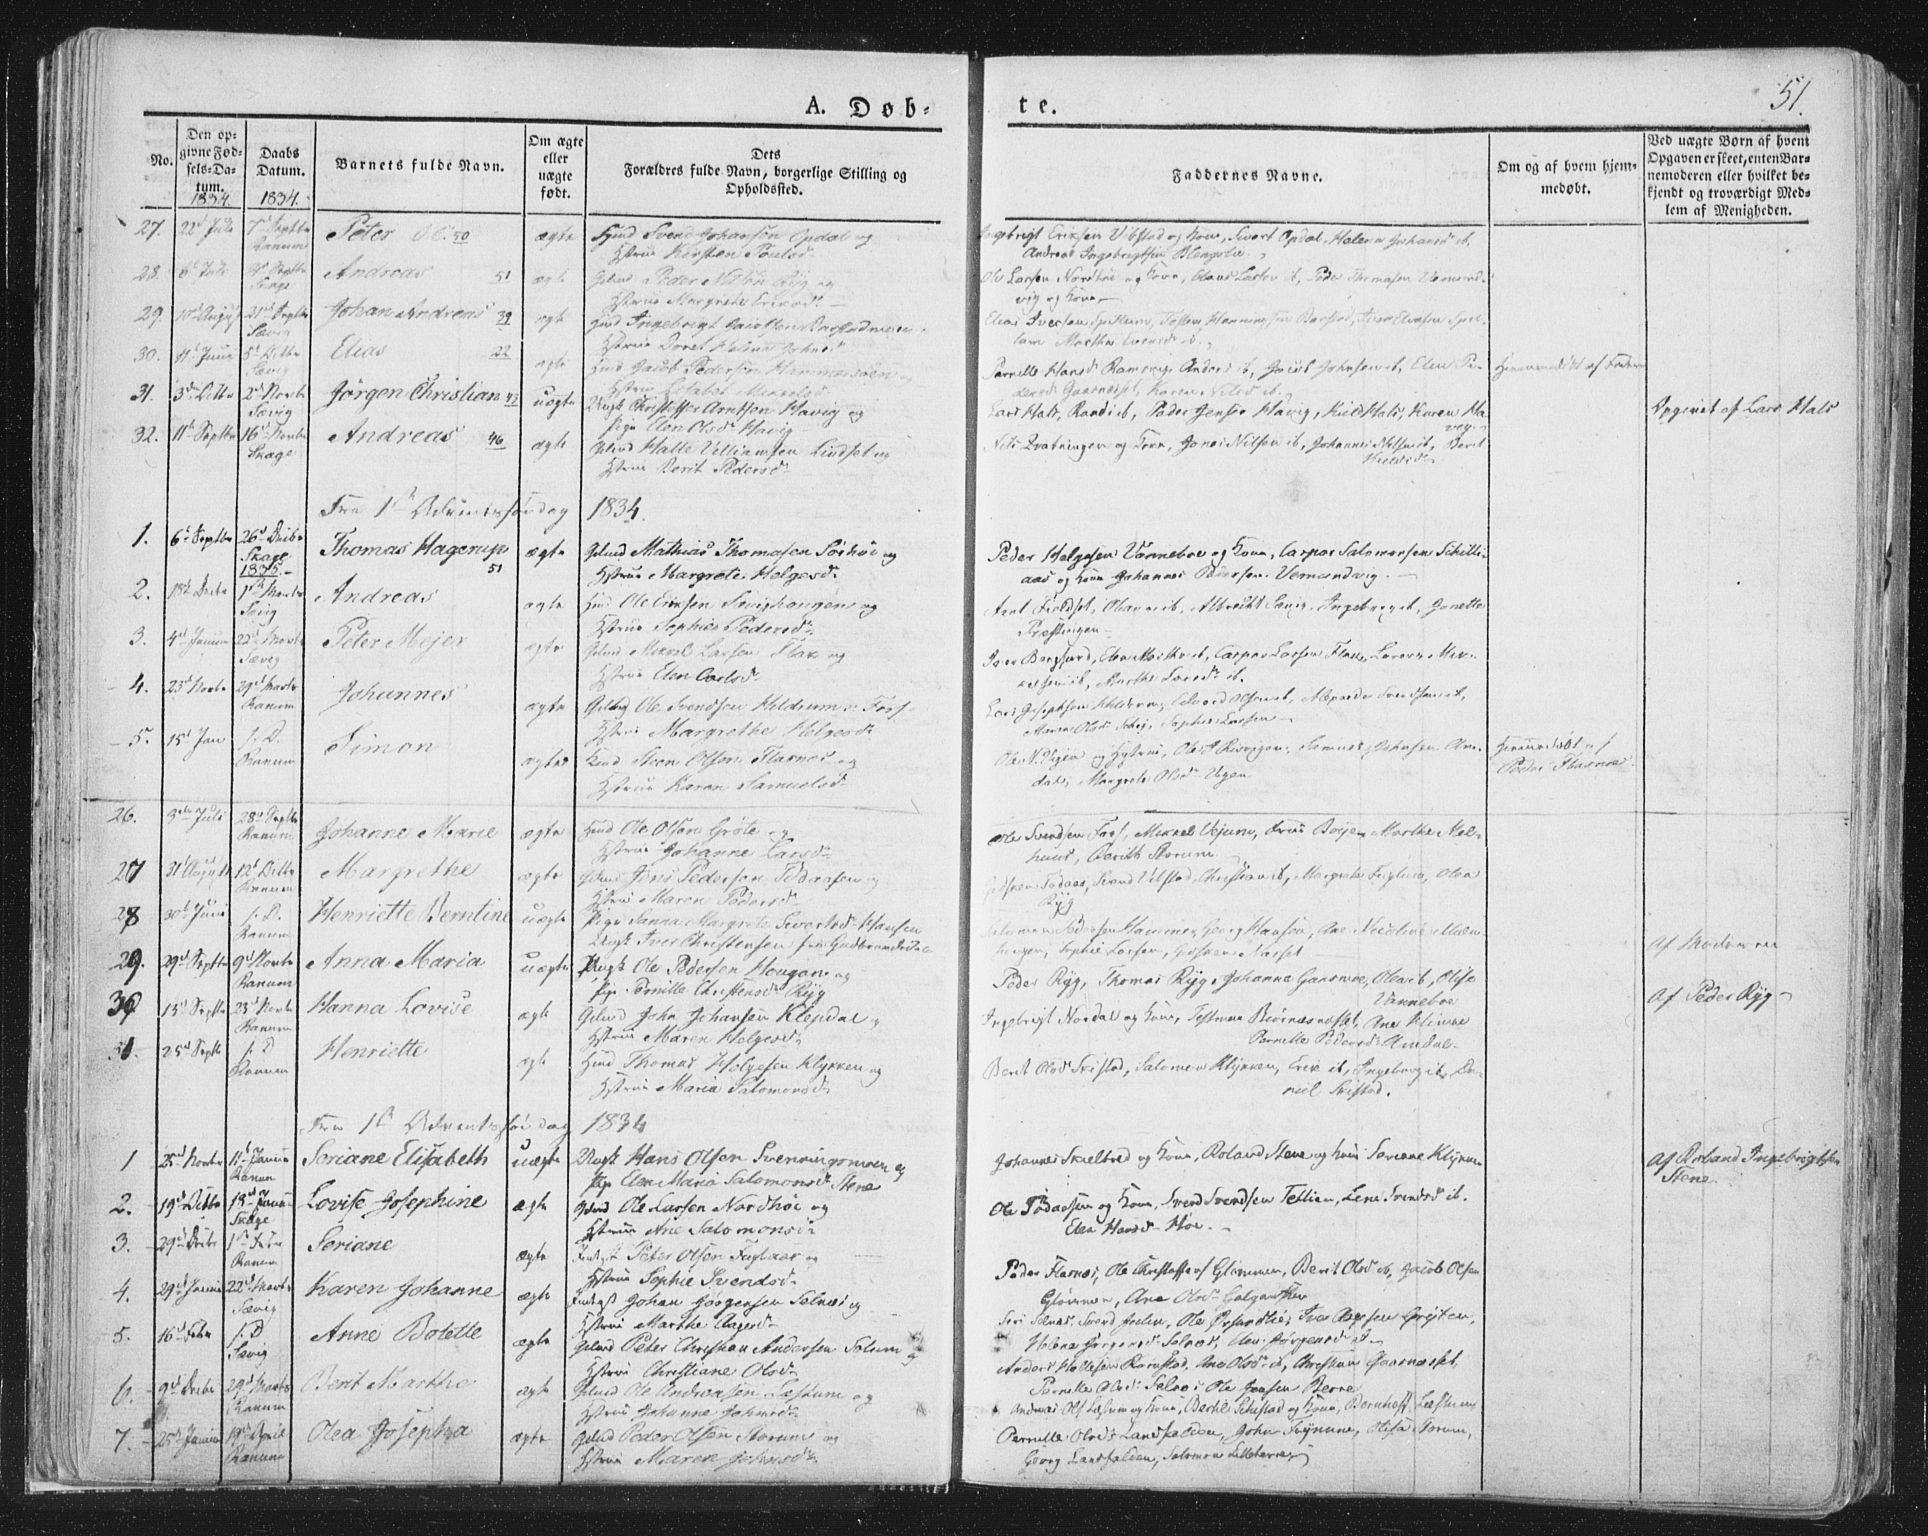 SAT, Ministerialprotokoller, klokkerbøker og fødselsregistre - Nord-Trøndelag, 764/L0551: Ministerialbok nr. 764A07a, 1824-1864, s. 51